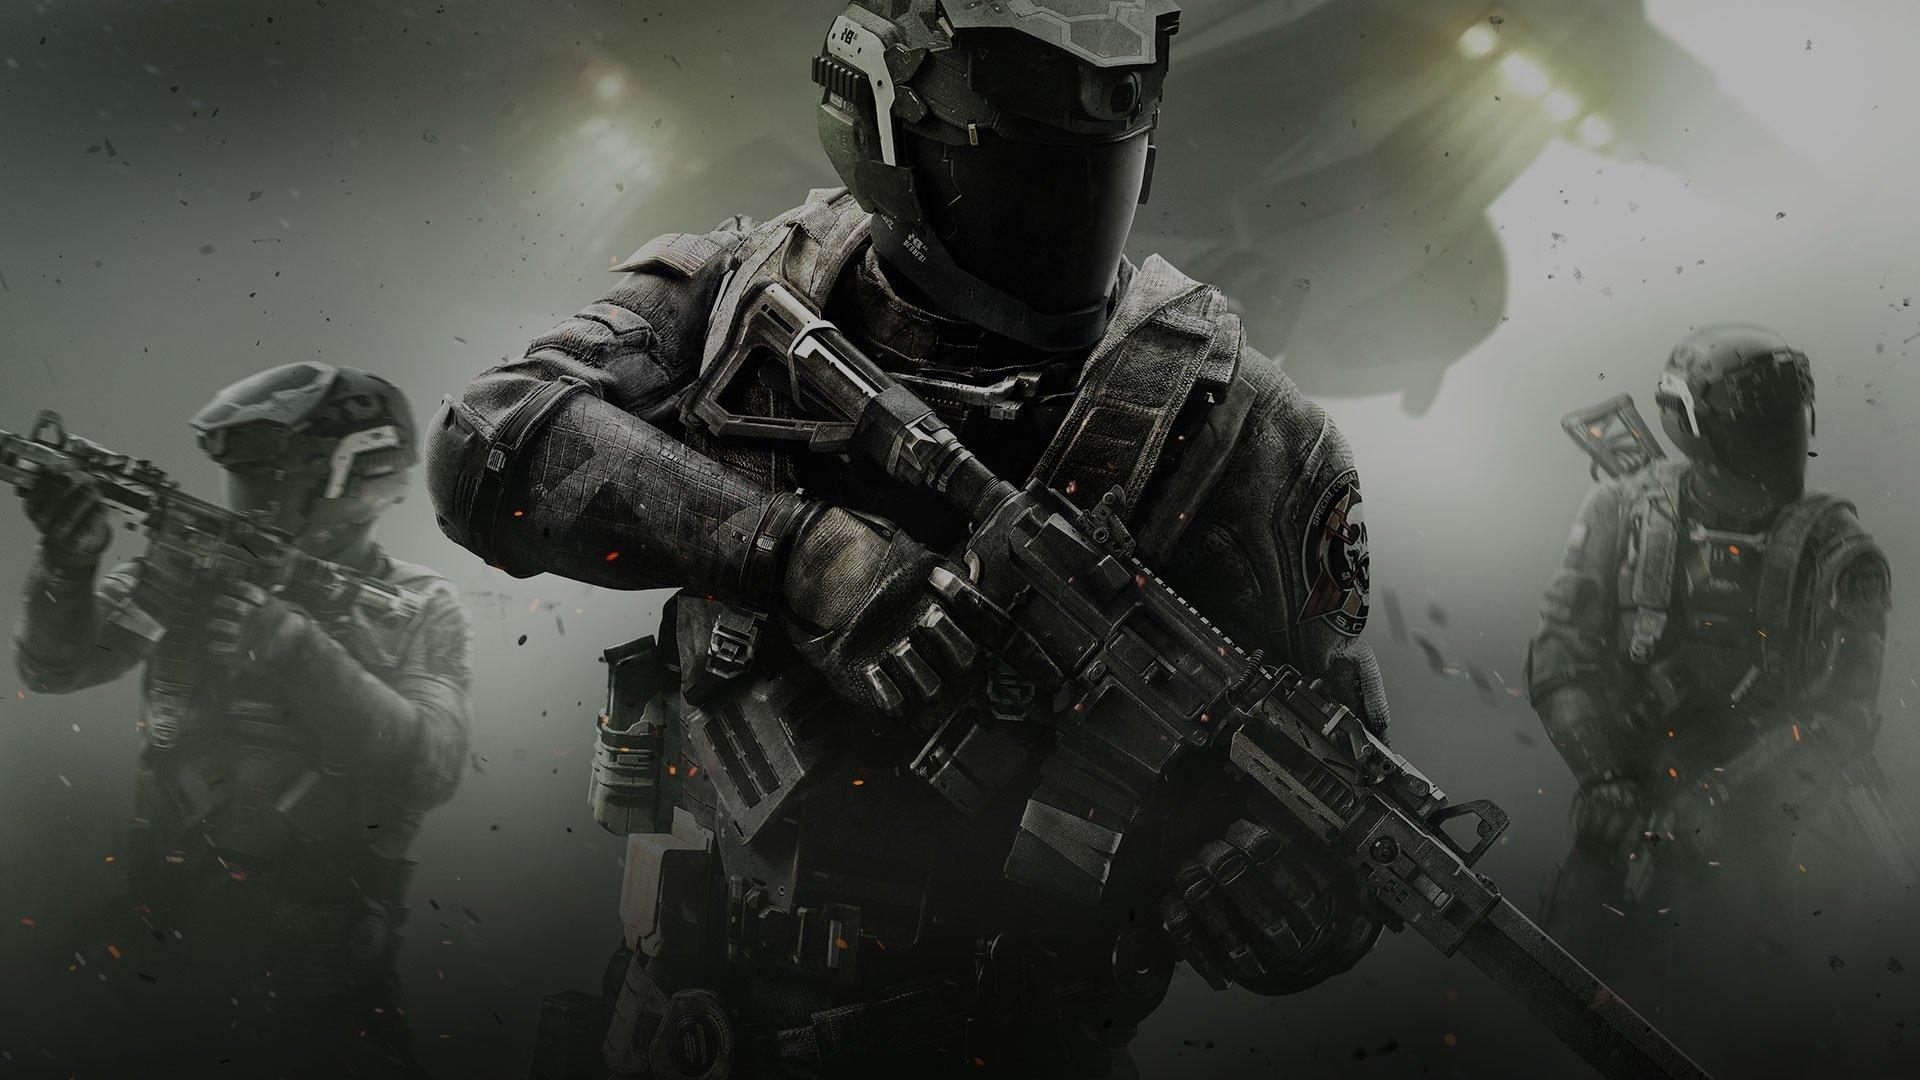 Call of Duty: Infinite Warfare multiplayer beta dates revealed